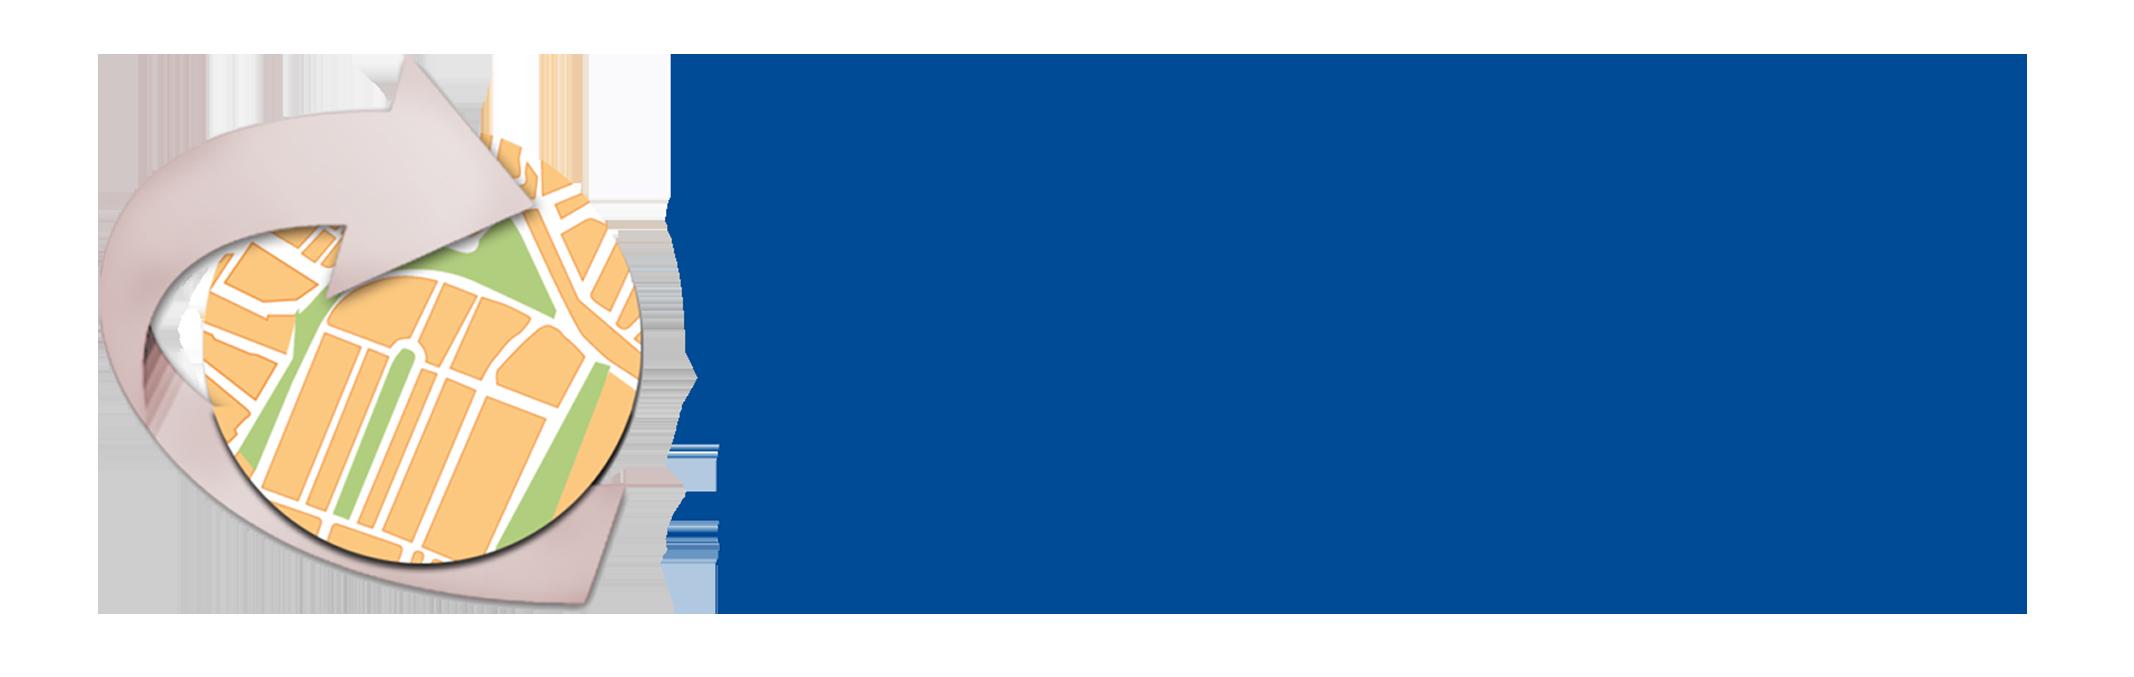 logo publiplanos blanco